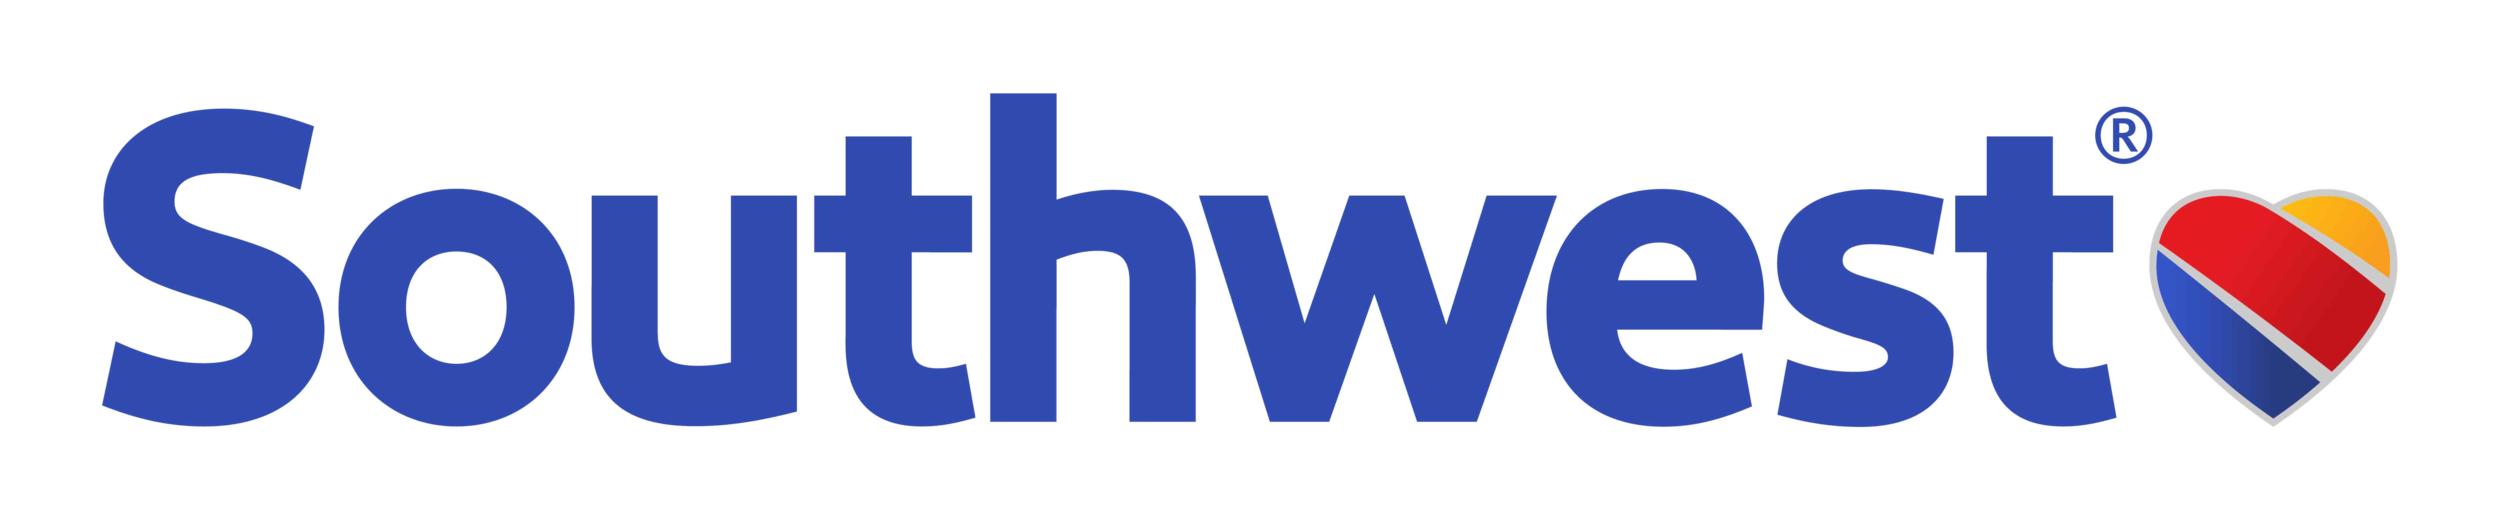 PNGPIX-COM-Southwest-Airlines-Logo-PNG-Transparent.png